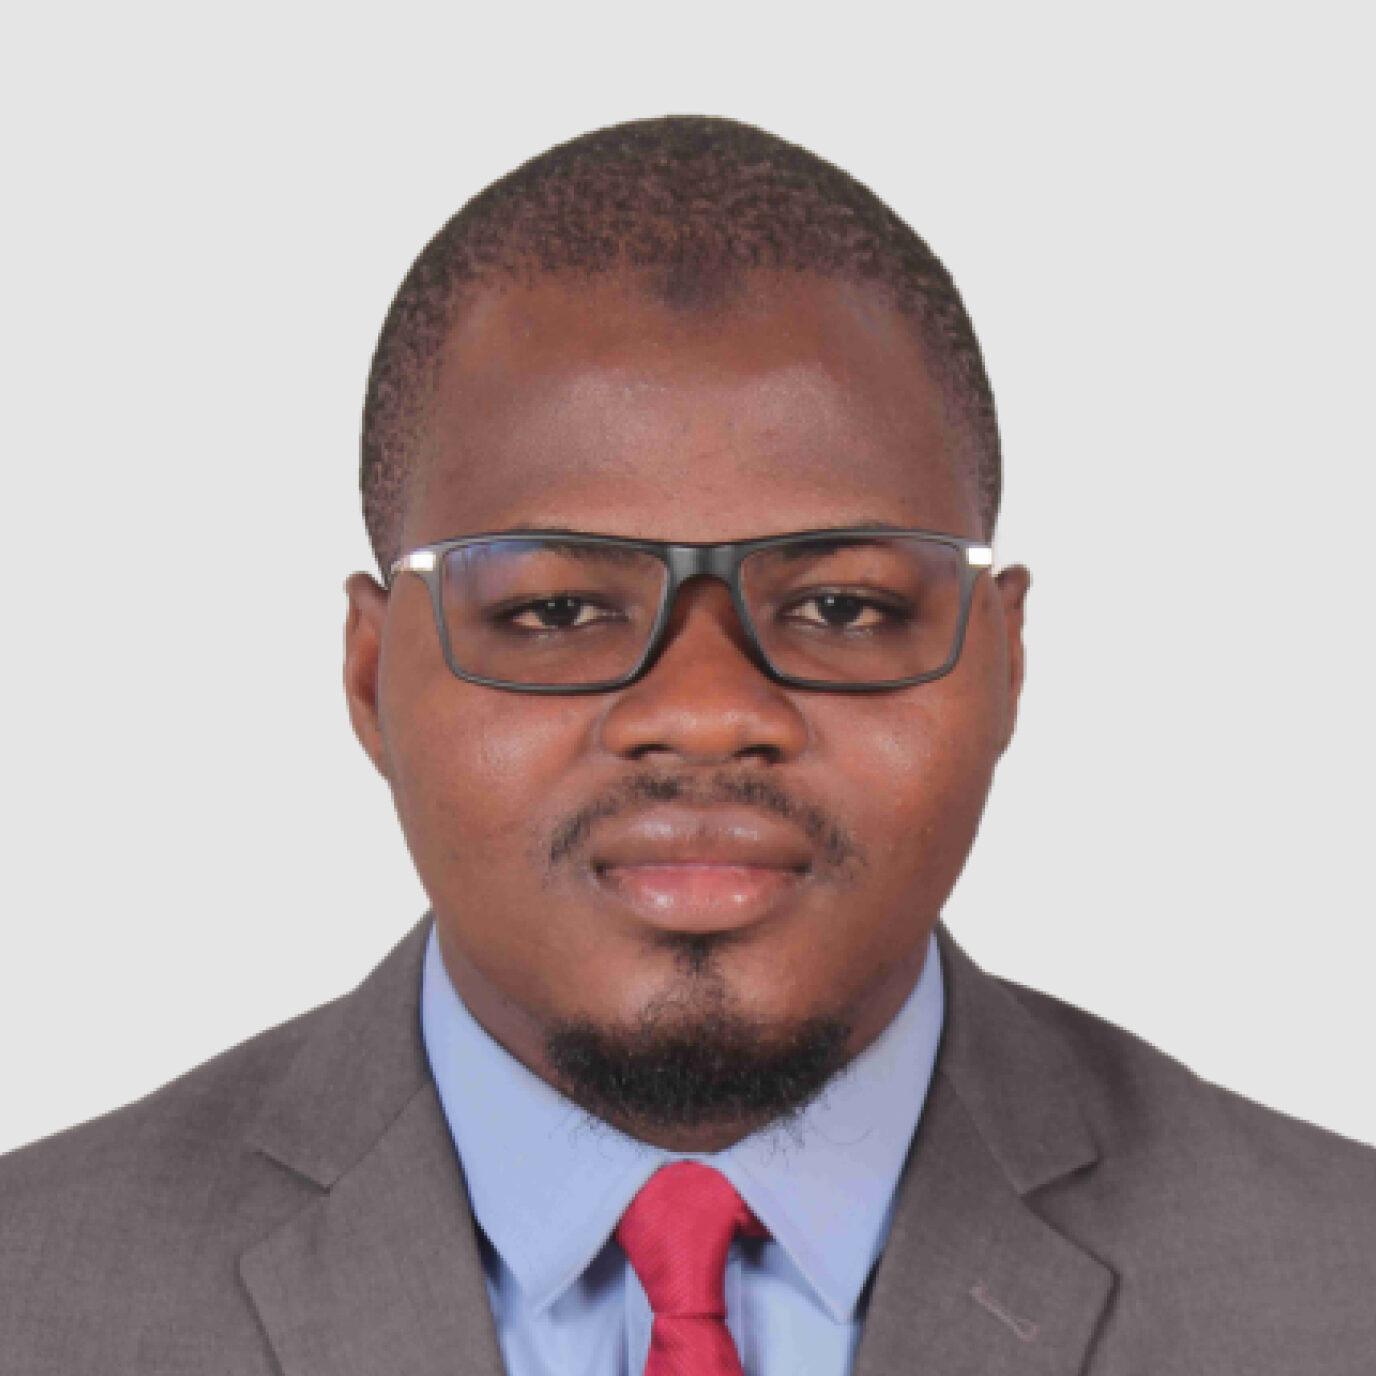 https://devafrique.com/wp-content/uploads/2021/07/Abdoul-Bassit-Sawadogo-Consultant-Burkina-Fasoto-2-e1631730131421.jpg